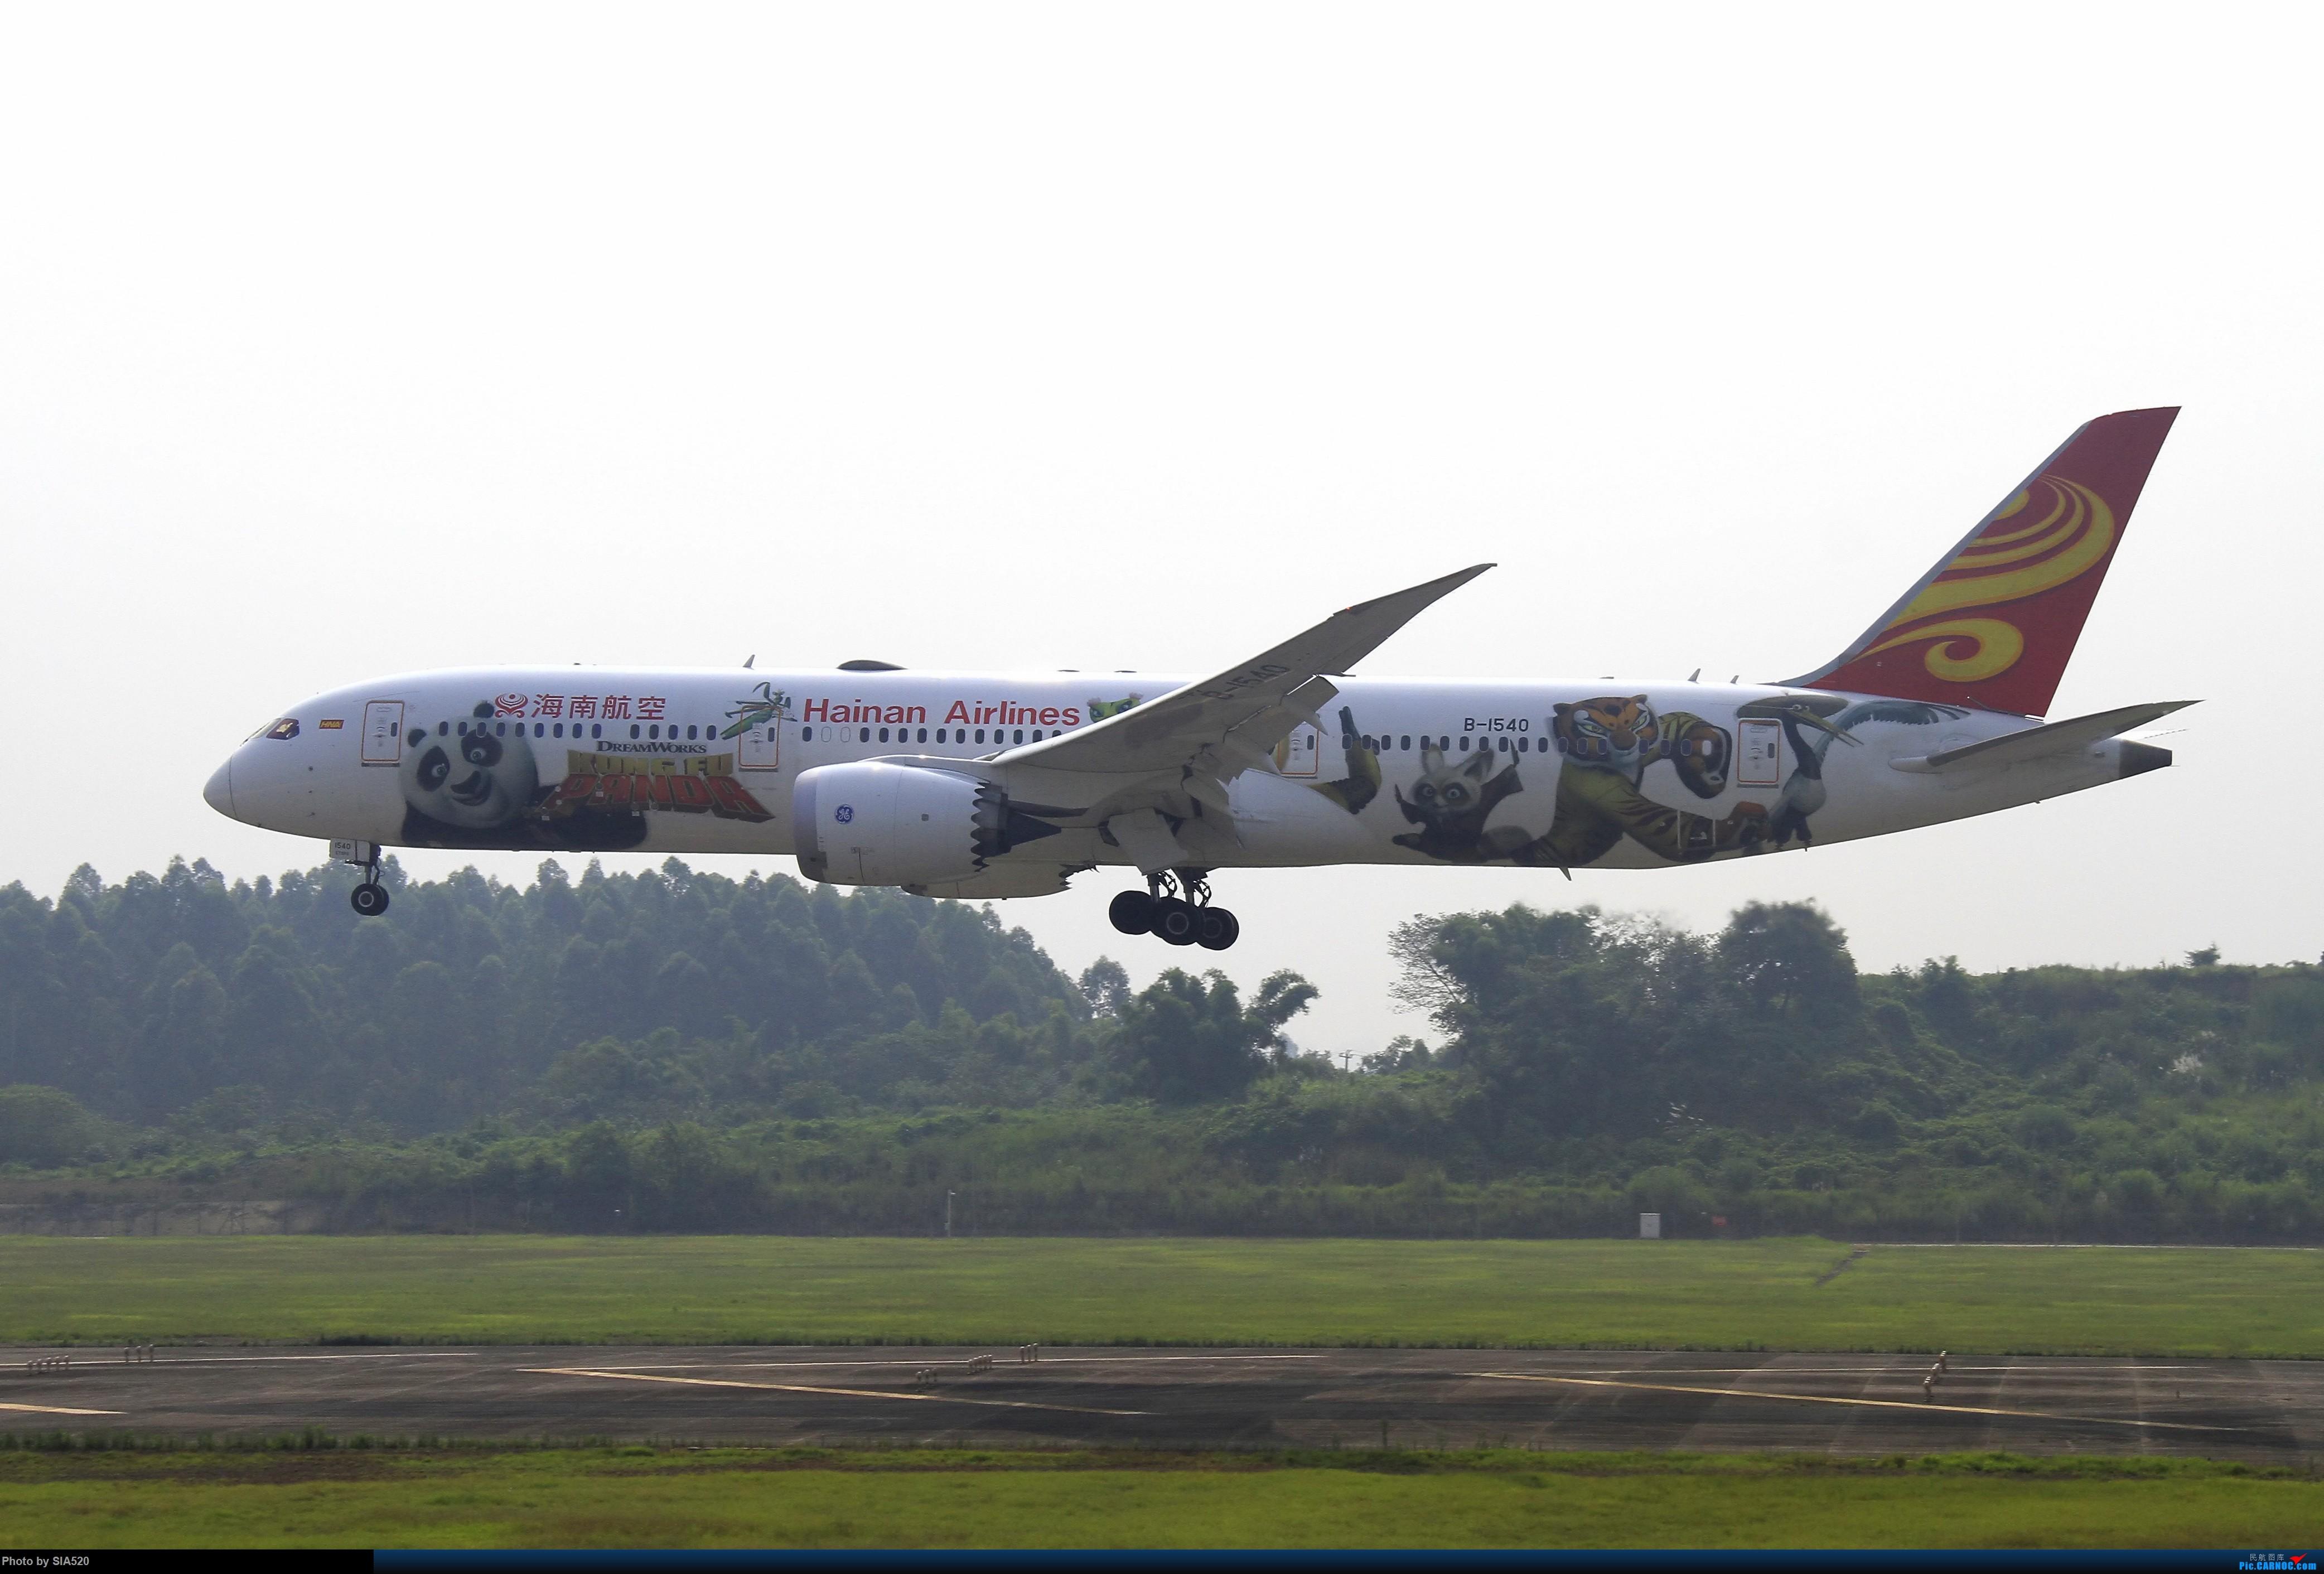 Re:[原创]听闻熊一要被换涂 发一波纪念 BOEING 787-9 B-1540 中国成都双流国际机场